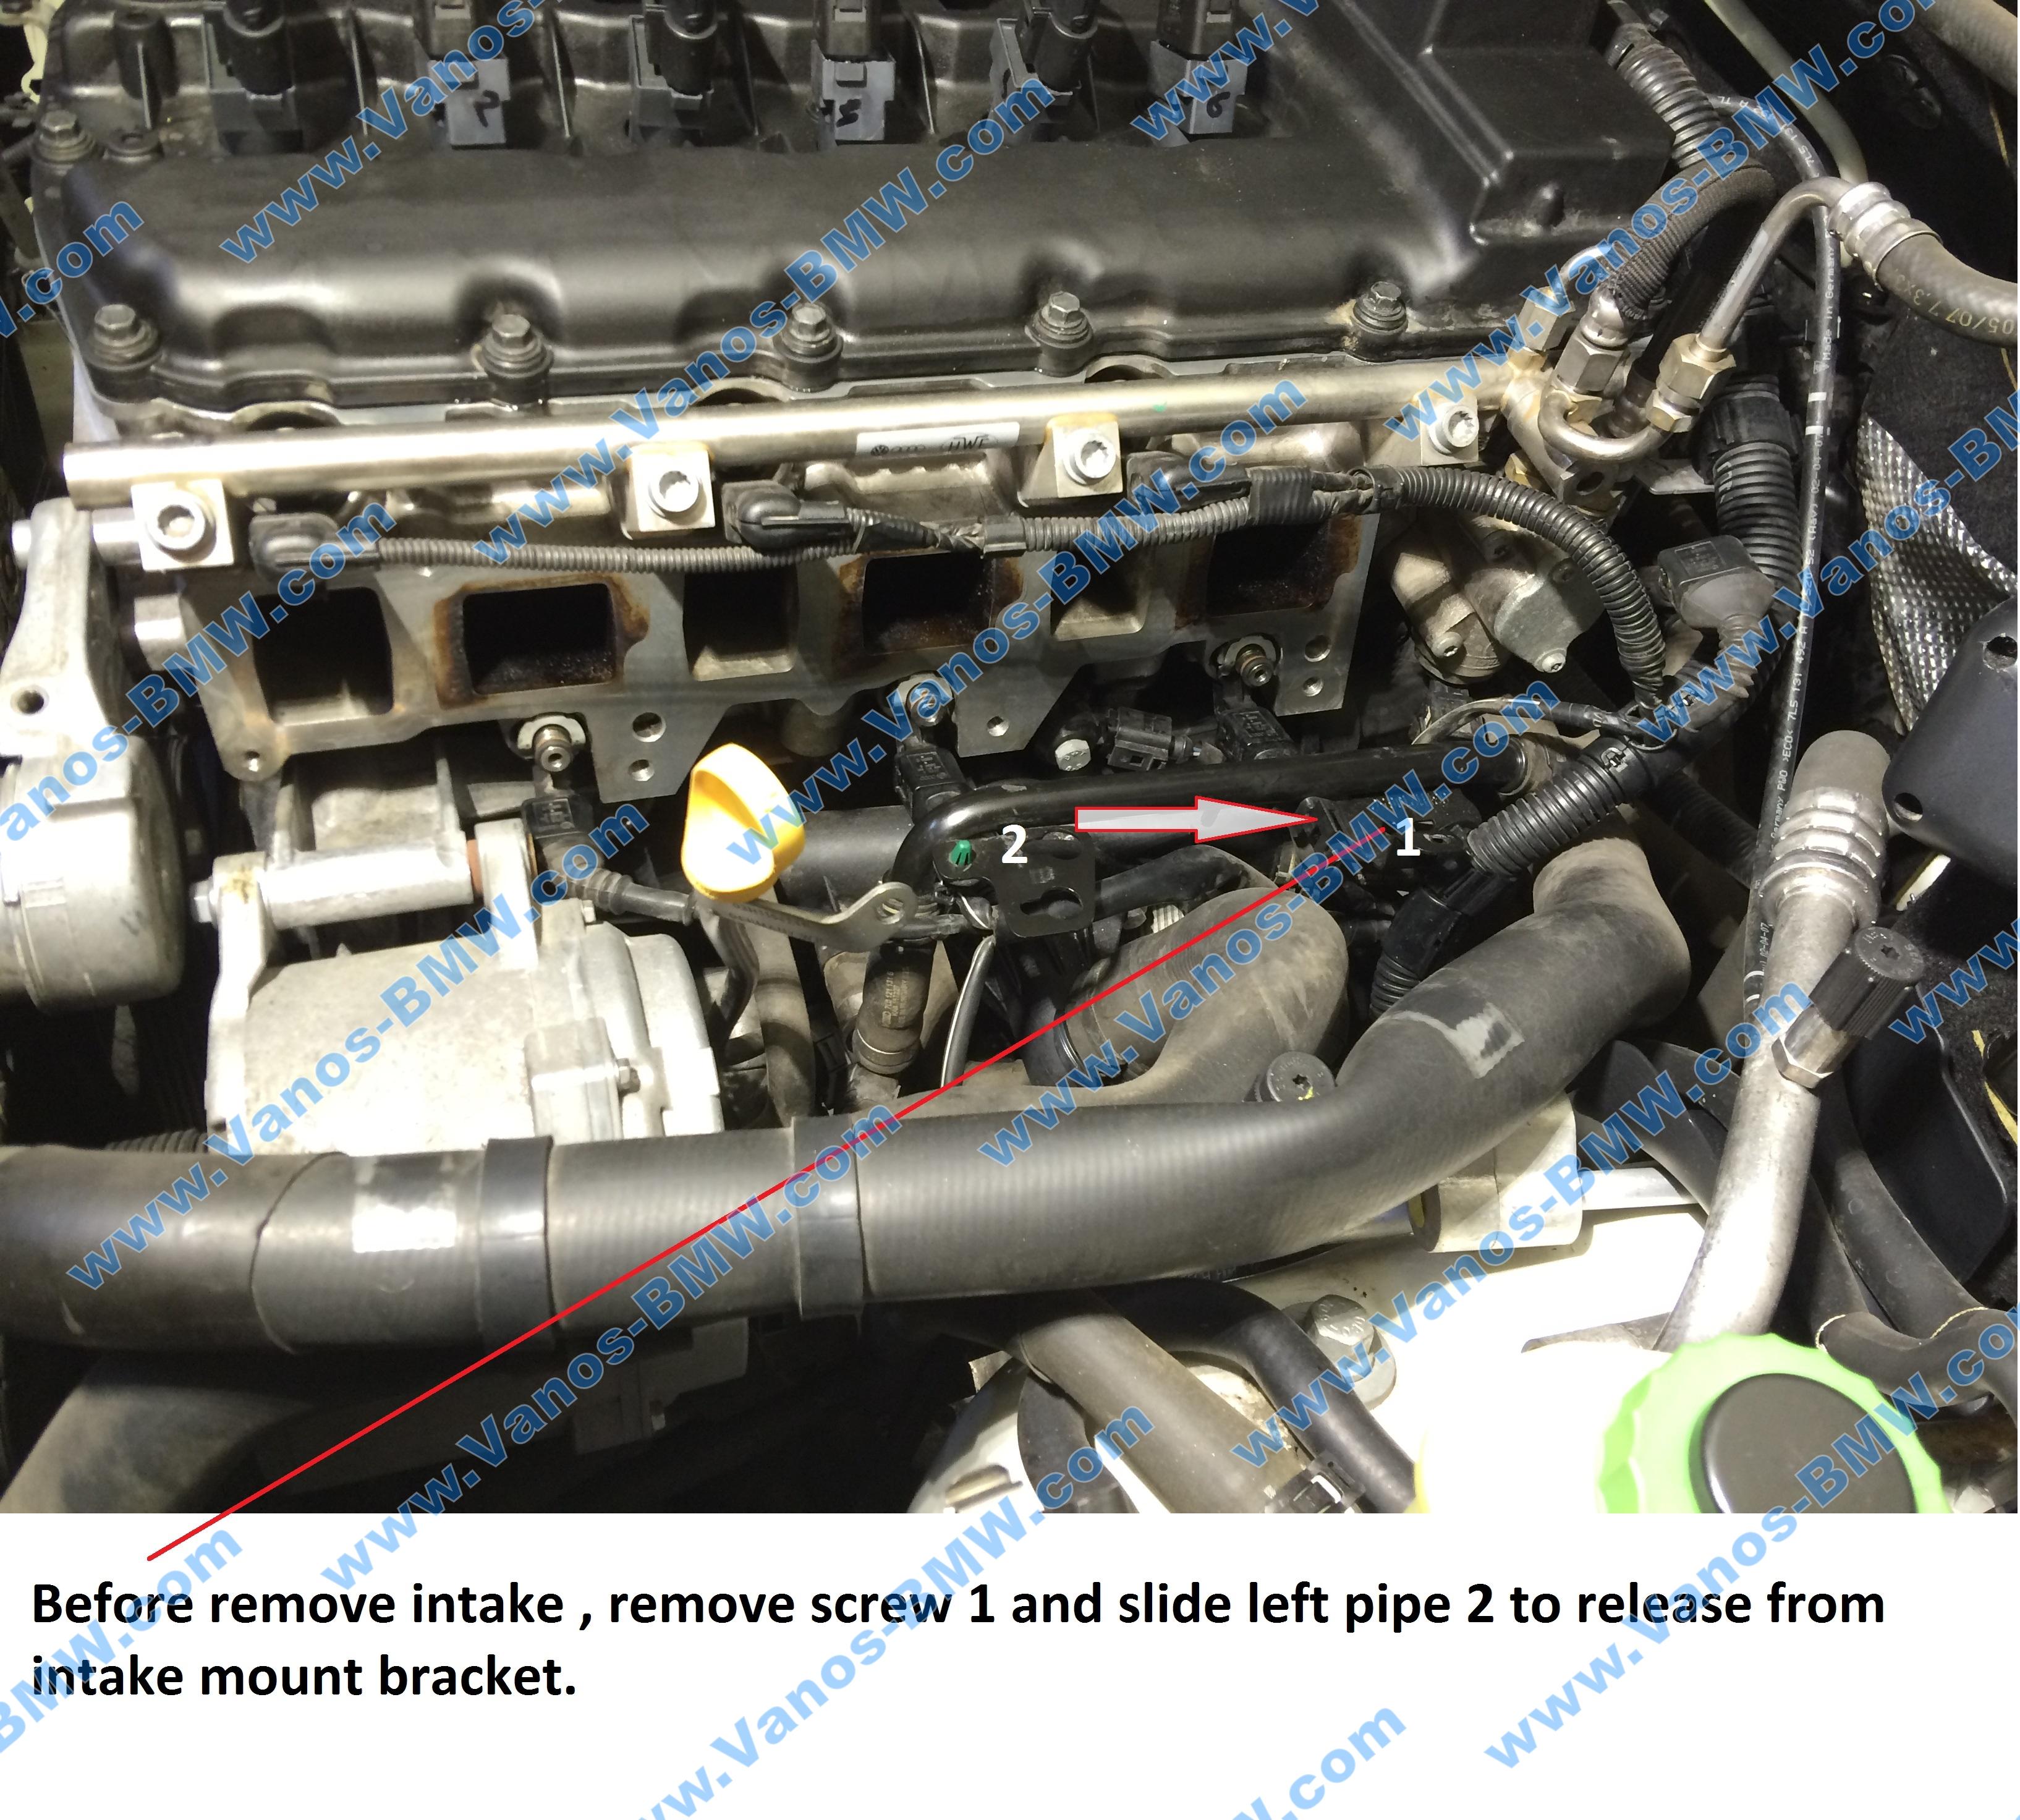 Diaphragm Valve For Crankcase Ventilation Porsche Cayenne